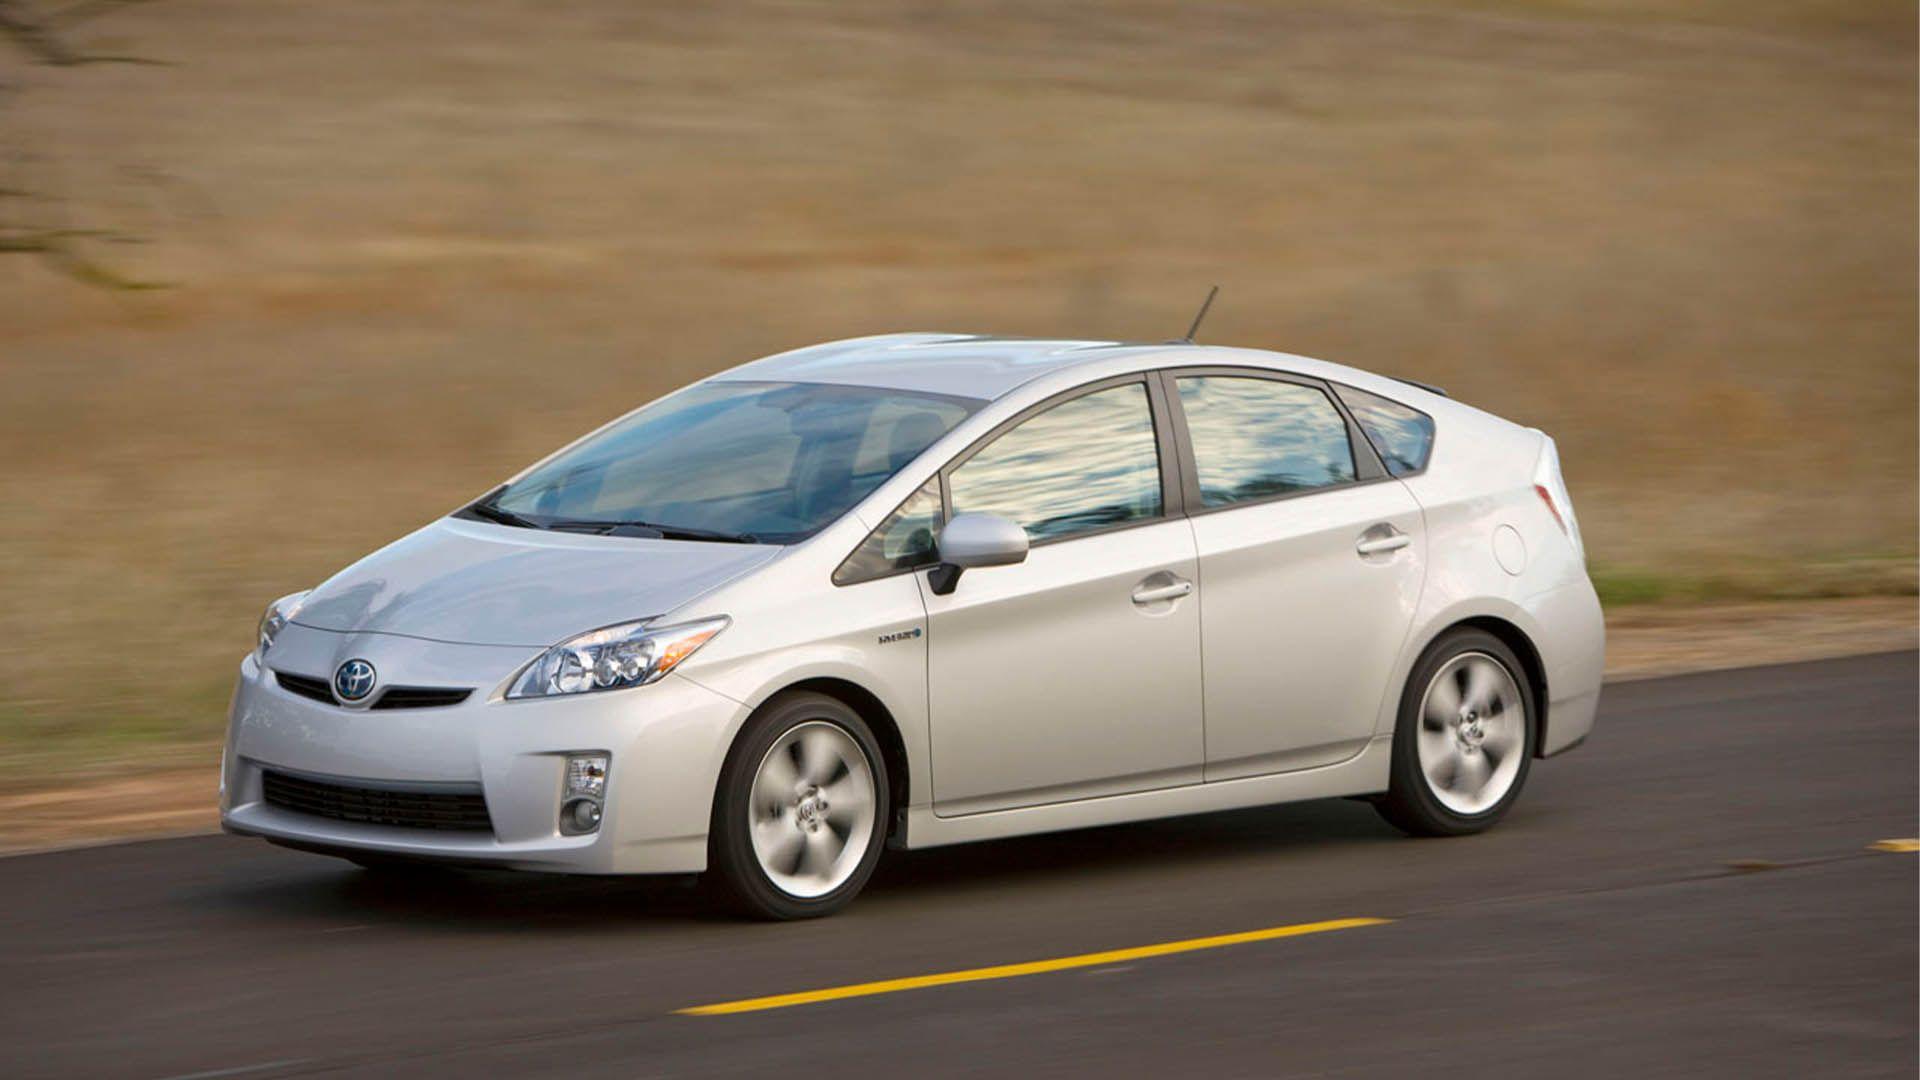 Hybrids Under 5000 Cardealershipsales In 2020 Toyota Prius Toyota Prius Interior Toyota Prius Hybrid